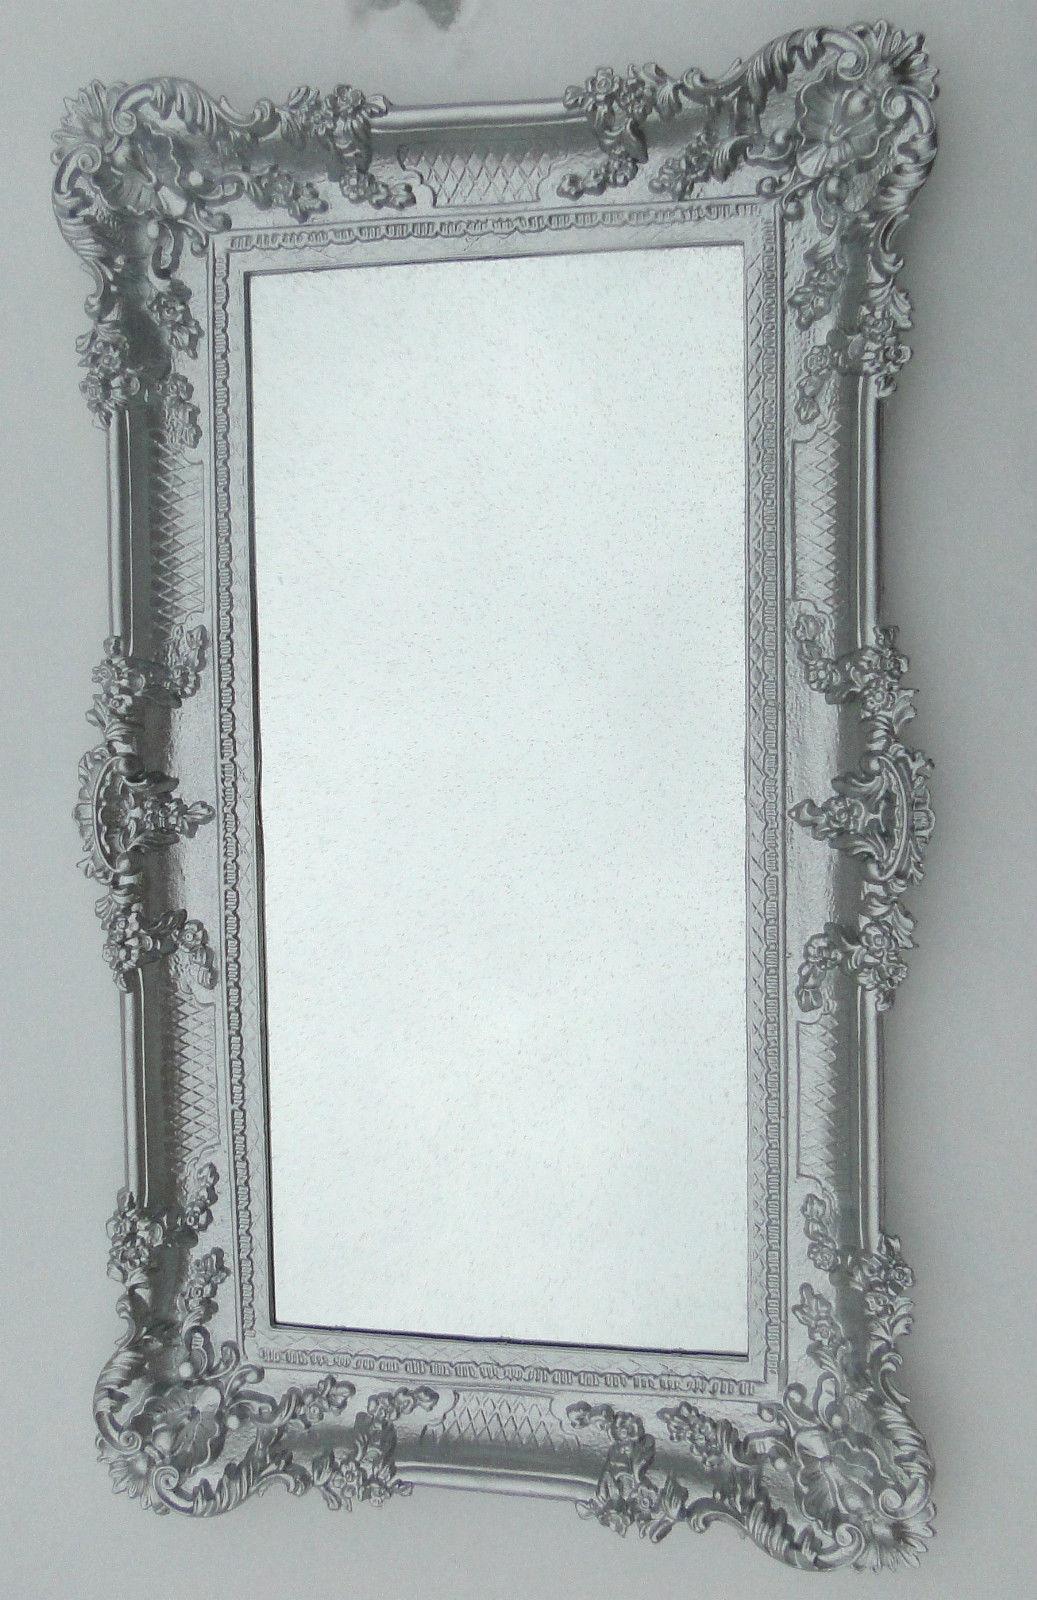 wandspiegel silber barock flur spiegel antik 97x57 badezimmerspiegel nr74 kaufen bei pintici. Black Bedroom Furniture Sets. Home Design Ideas